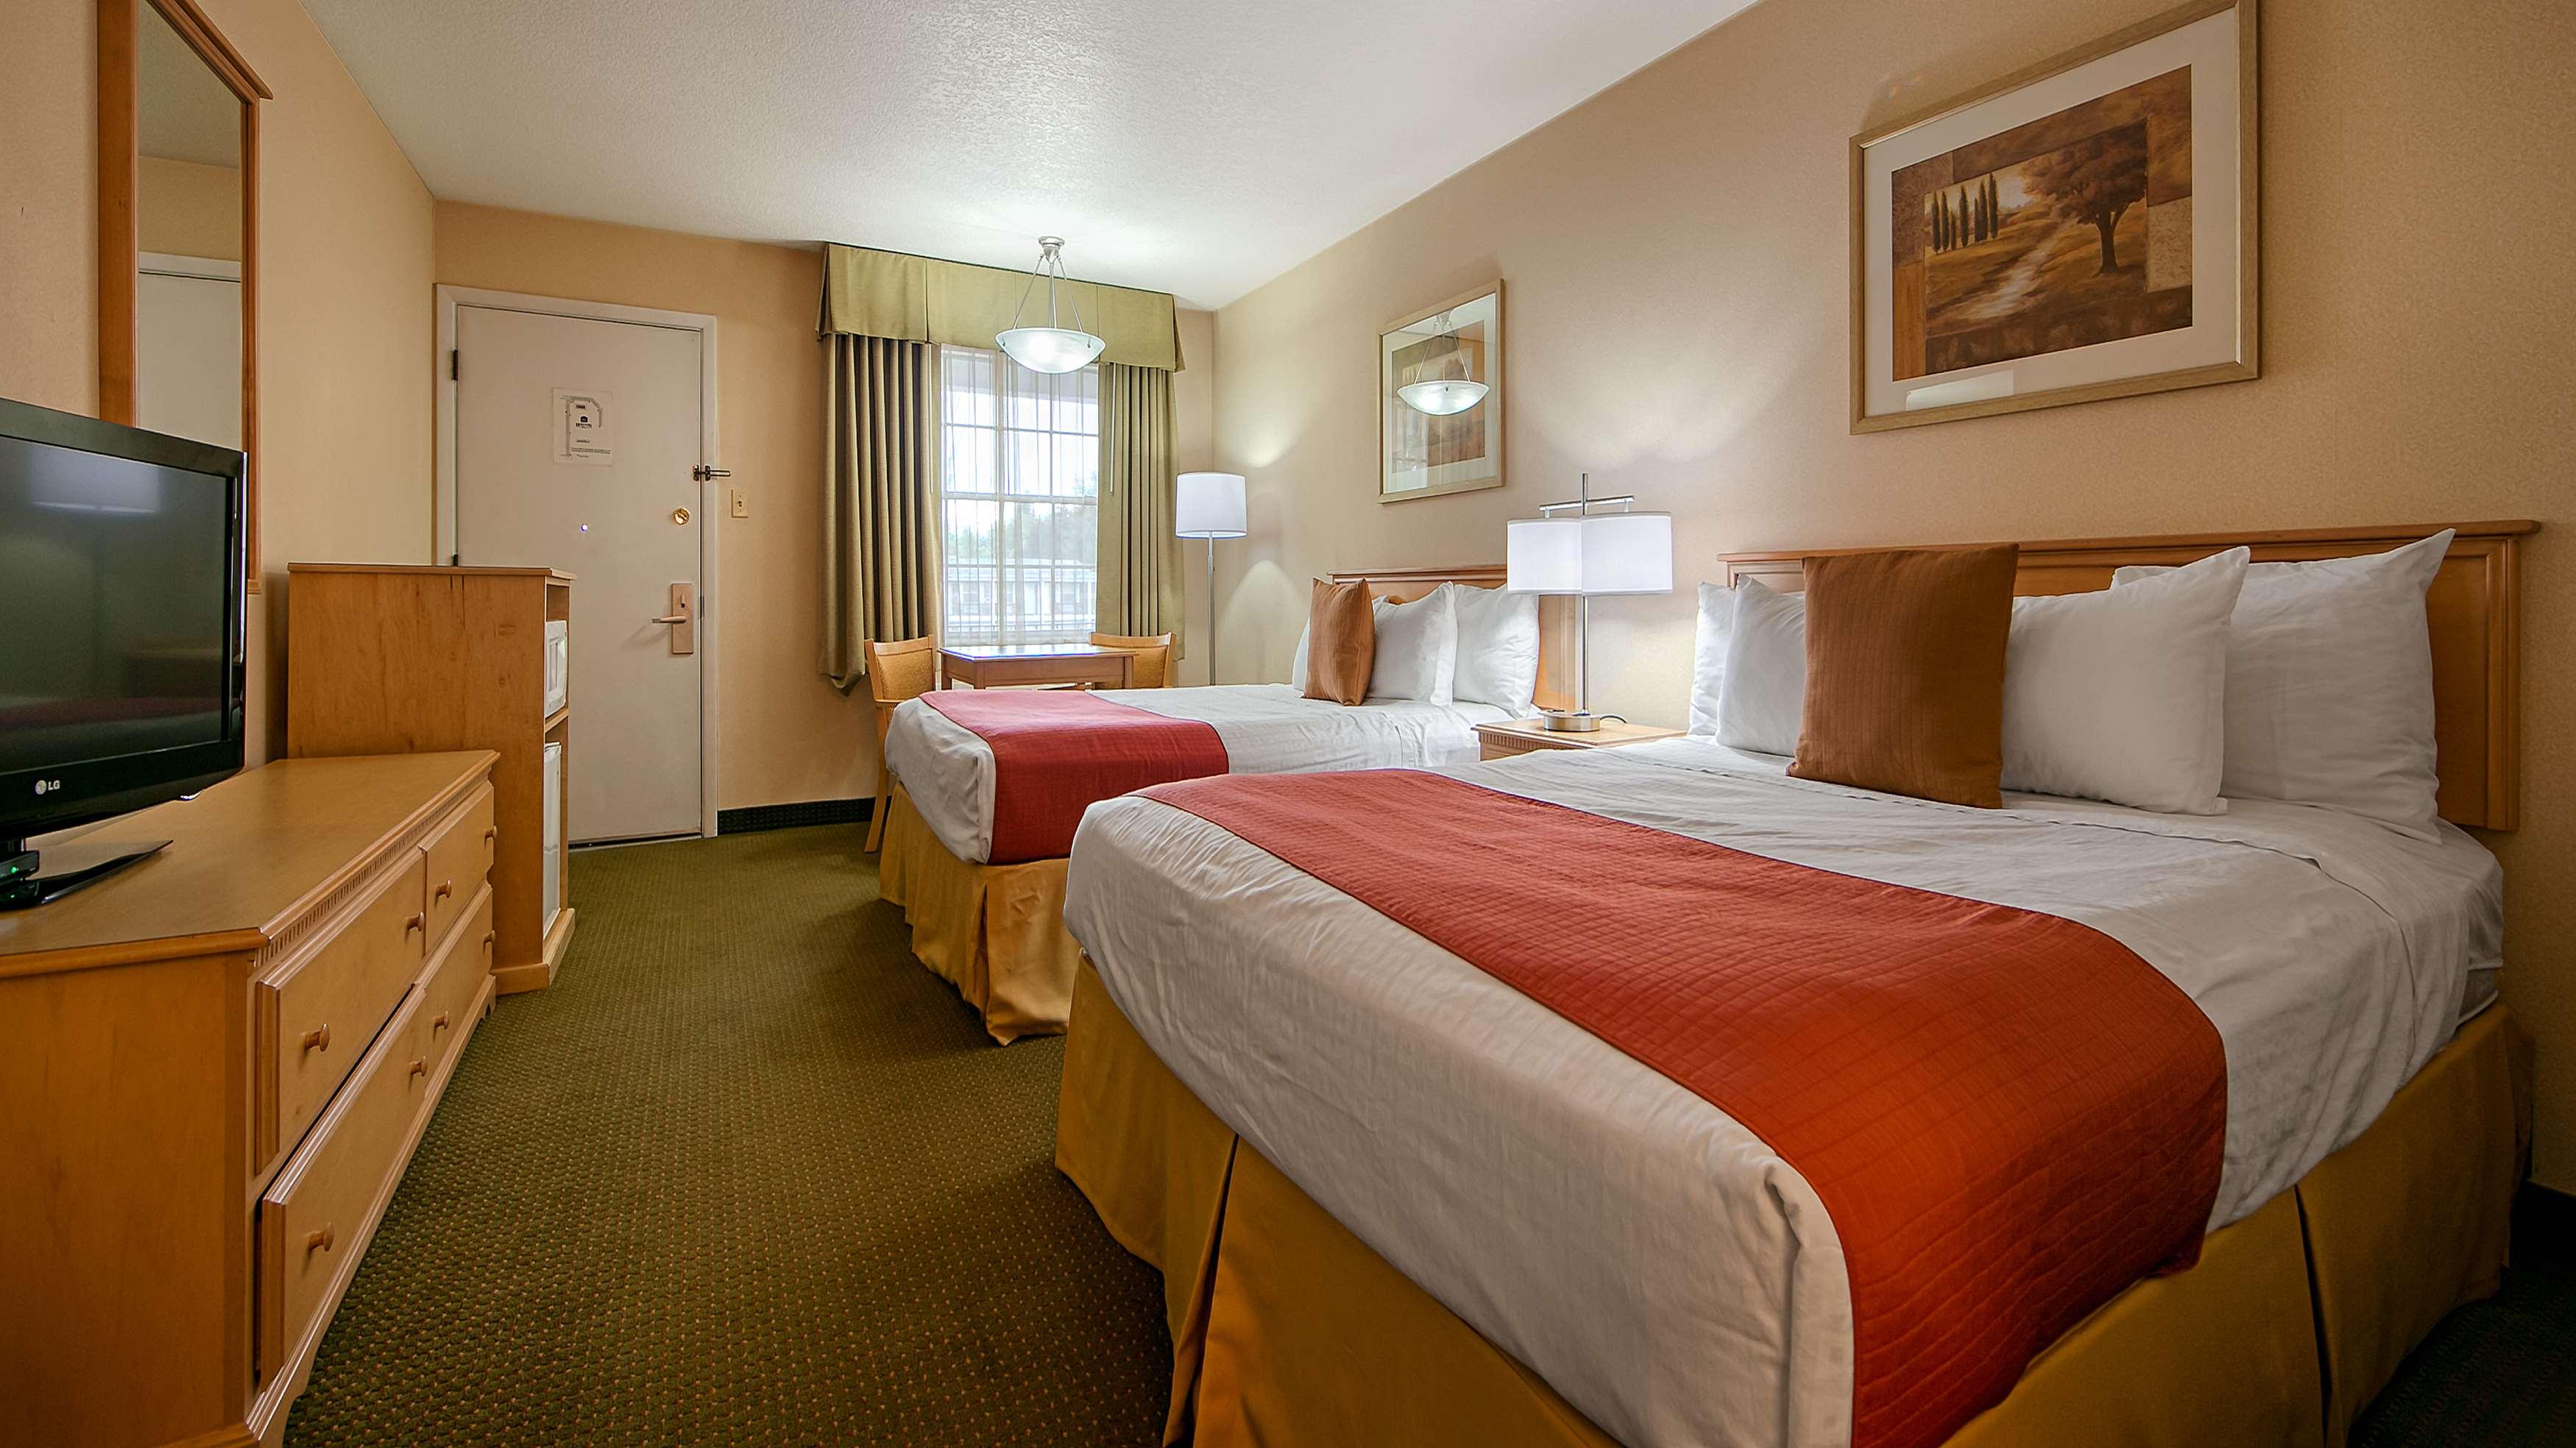 Best Western Horizon Inn image 34